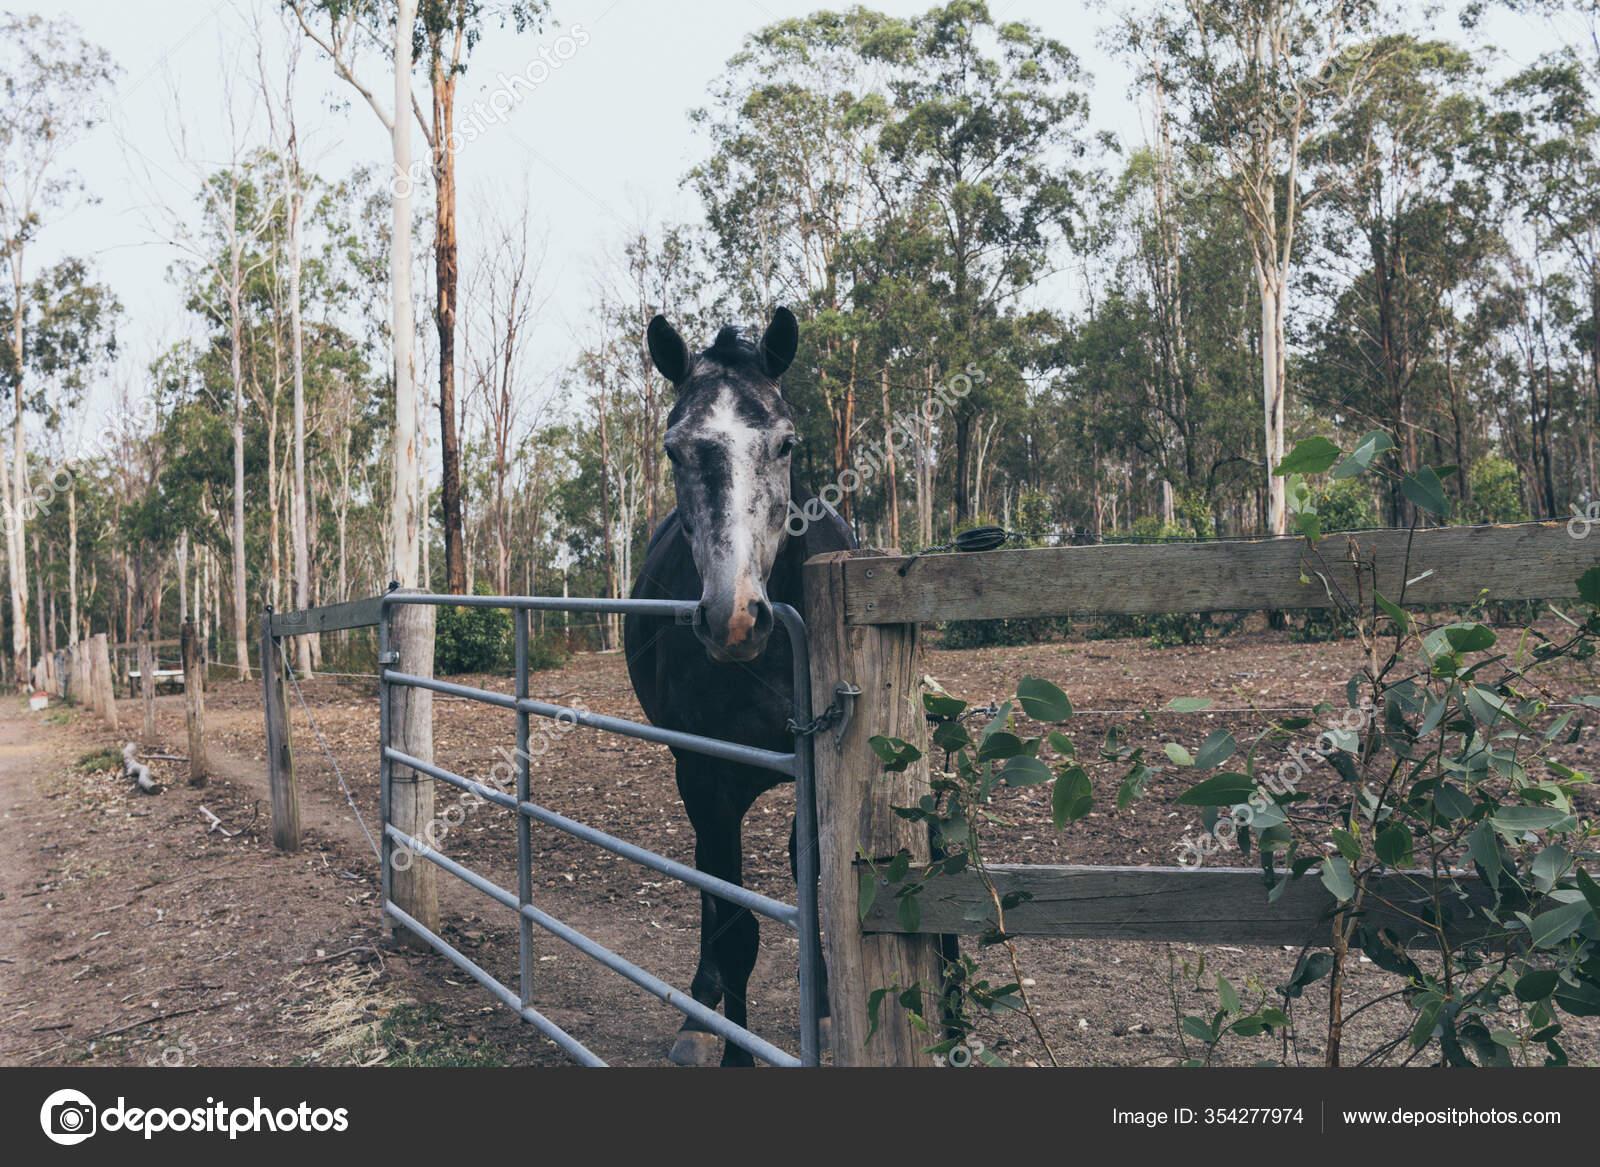 Beautiful Black Horse White Stain Forehead Wild Ranch Spanish Horse Stock Photo C Yaizahigueras 354277974